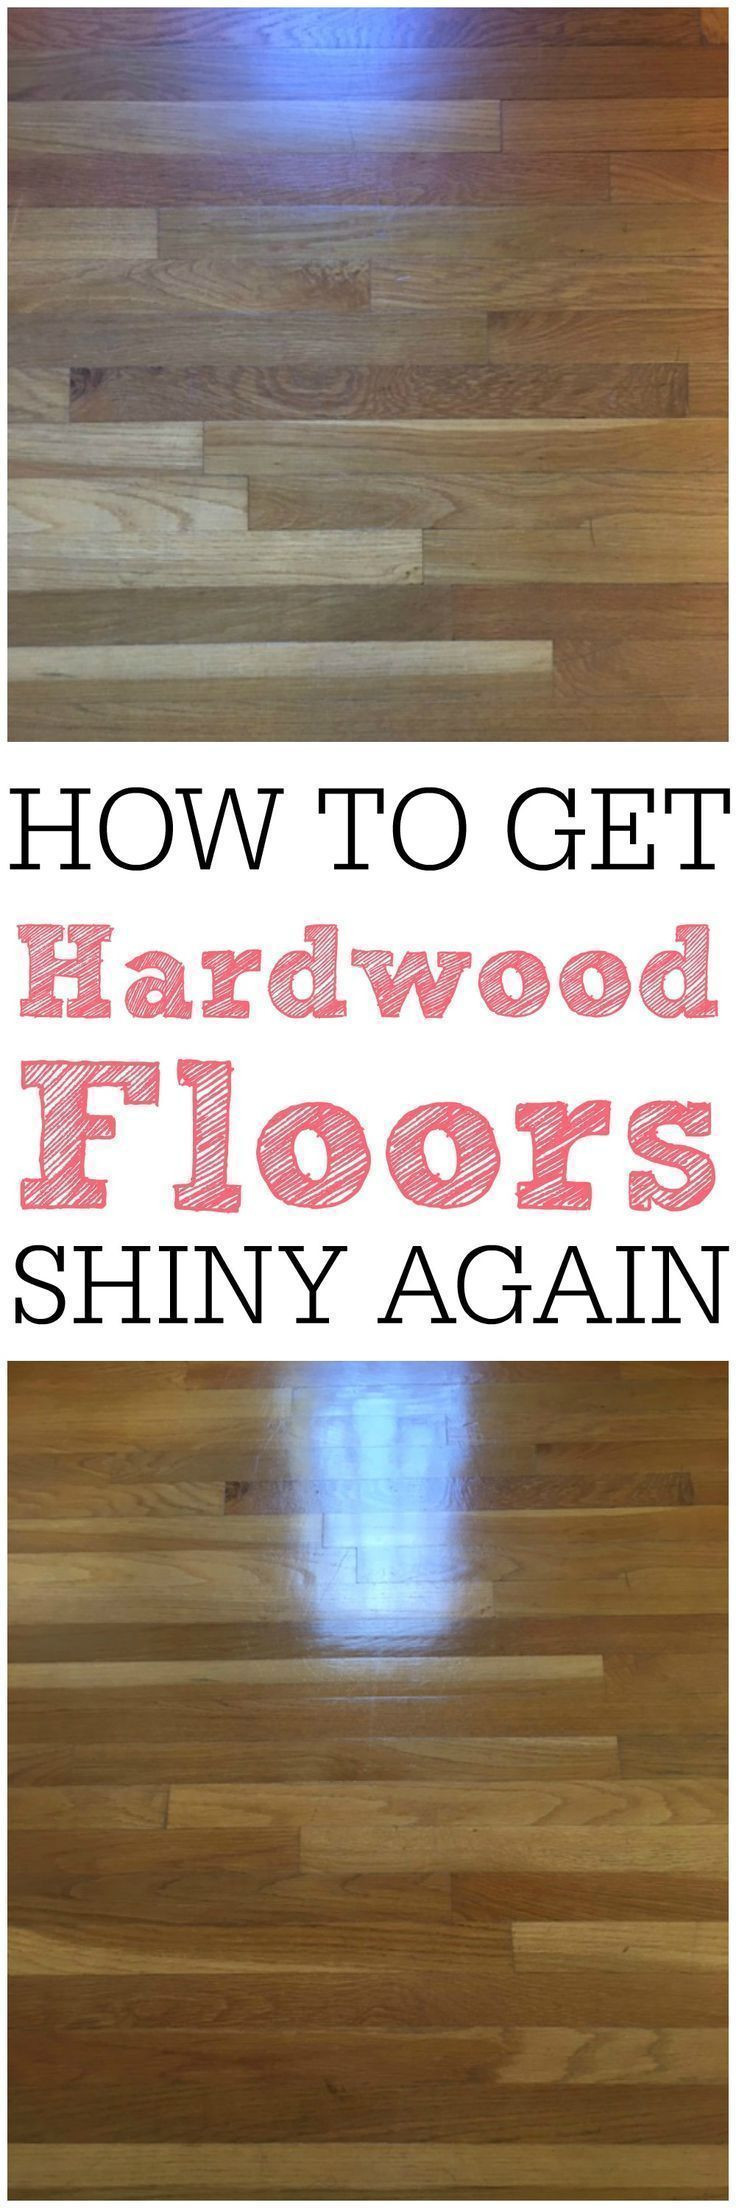 bona hardwood floor cleaner 22 oz of 1252 best floor cleaning tips images on pinterest cleaning regarding how to get hardwood floors to shine again